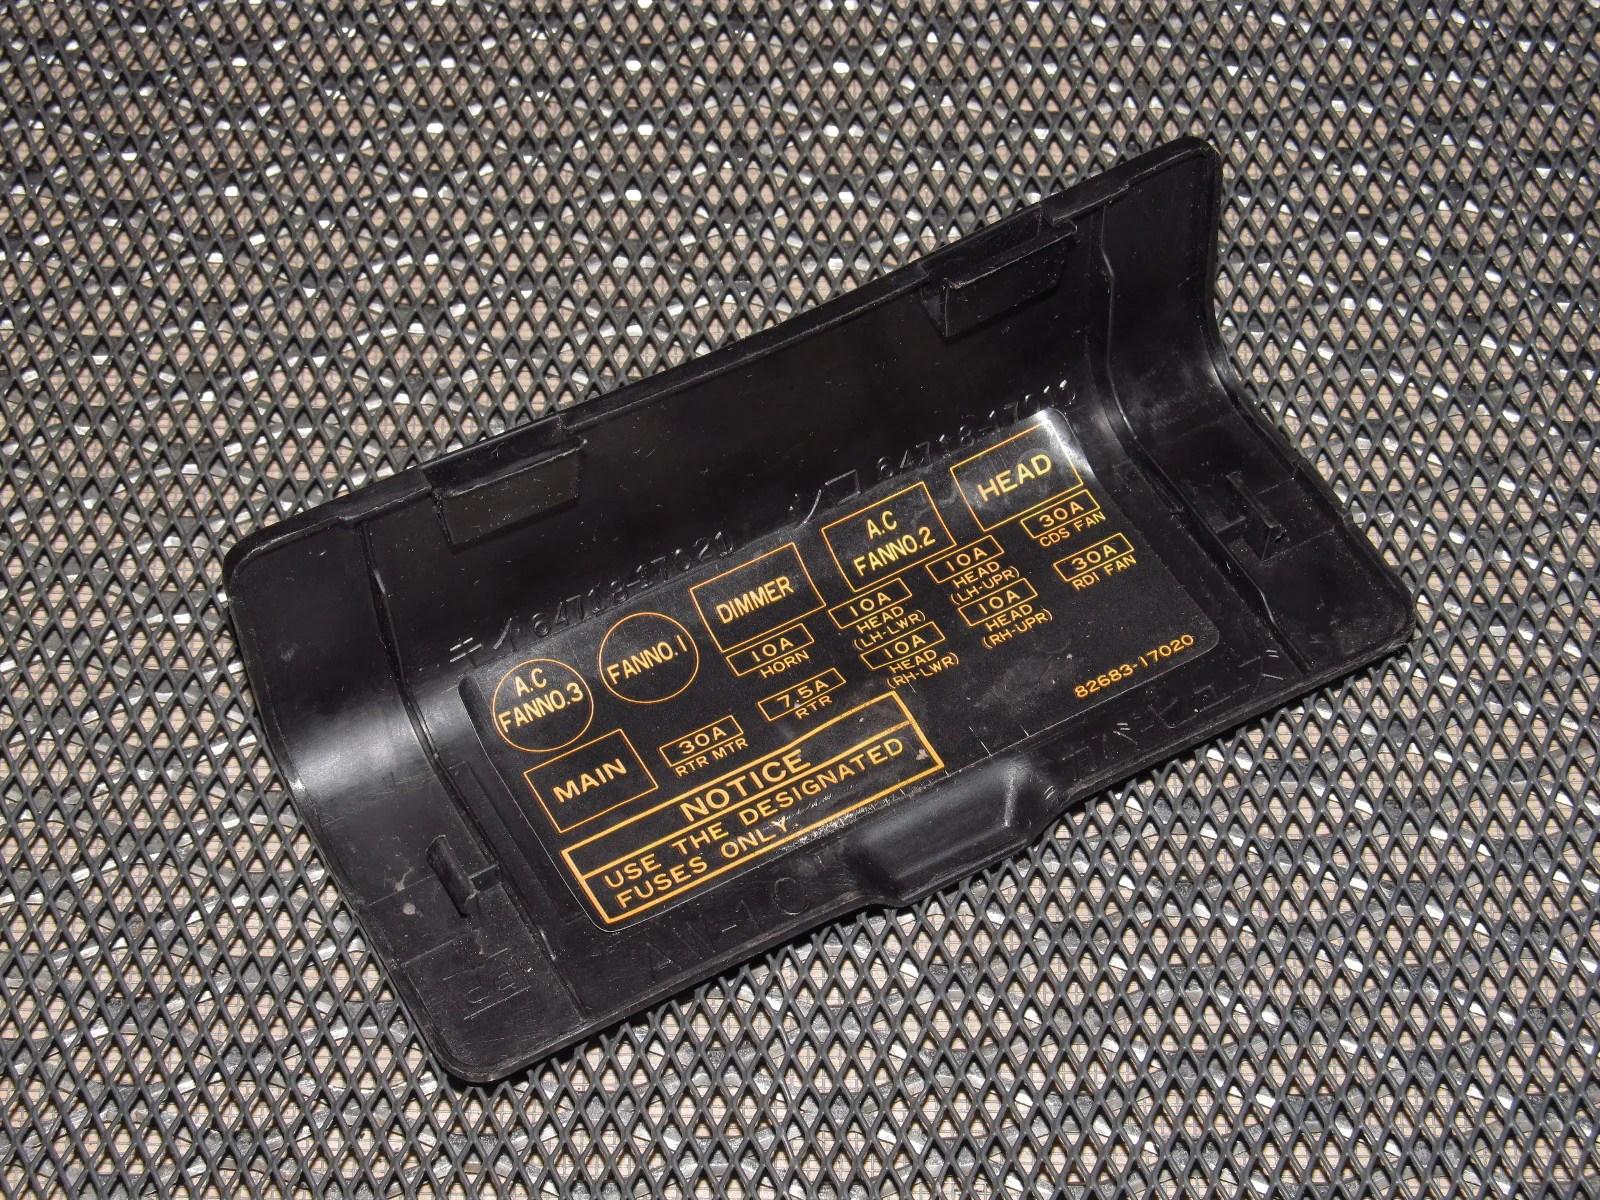 hight resolution of 1991 toyotum mr2 fuse box wiring uk